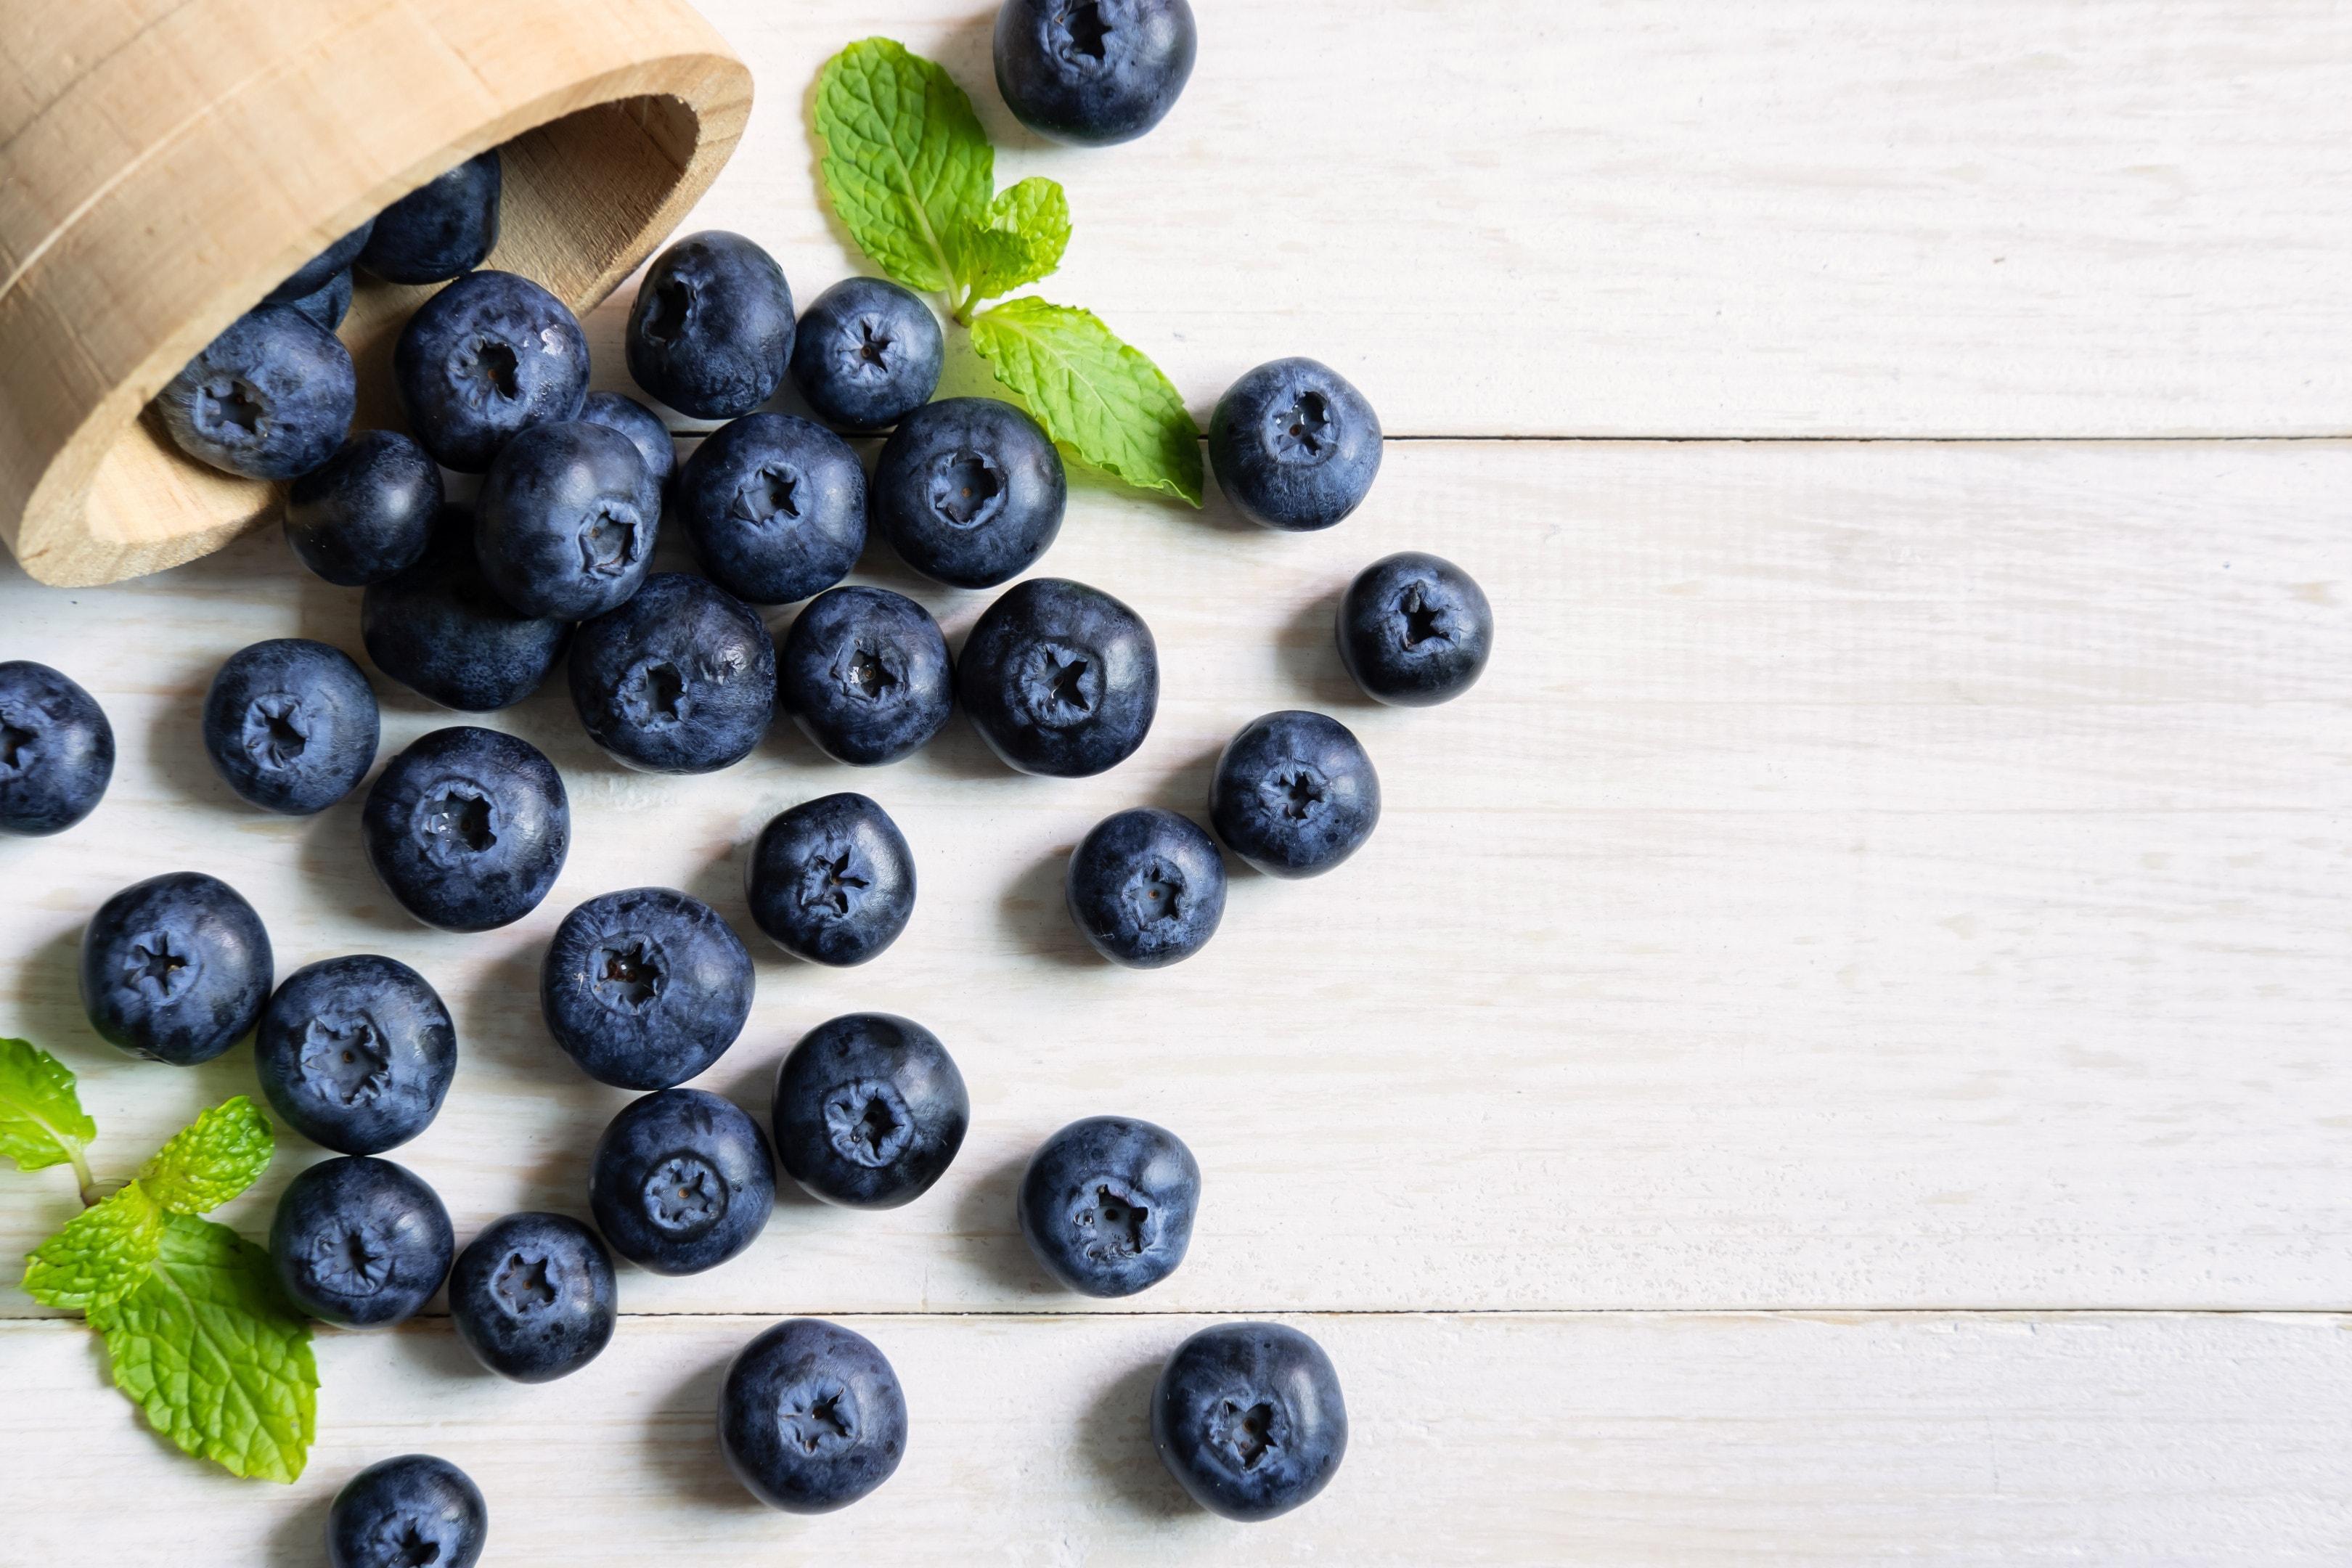 Fresh blueberries on white wooden table